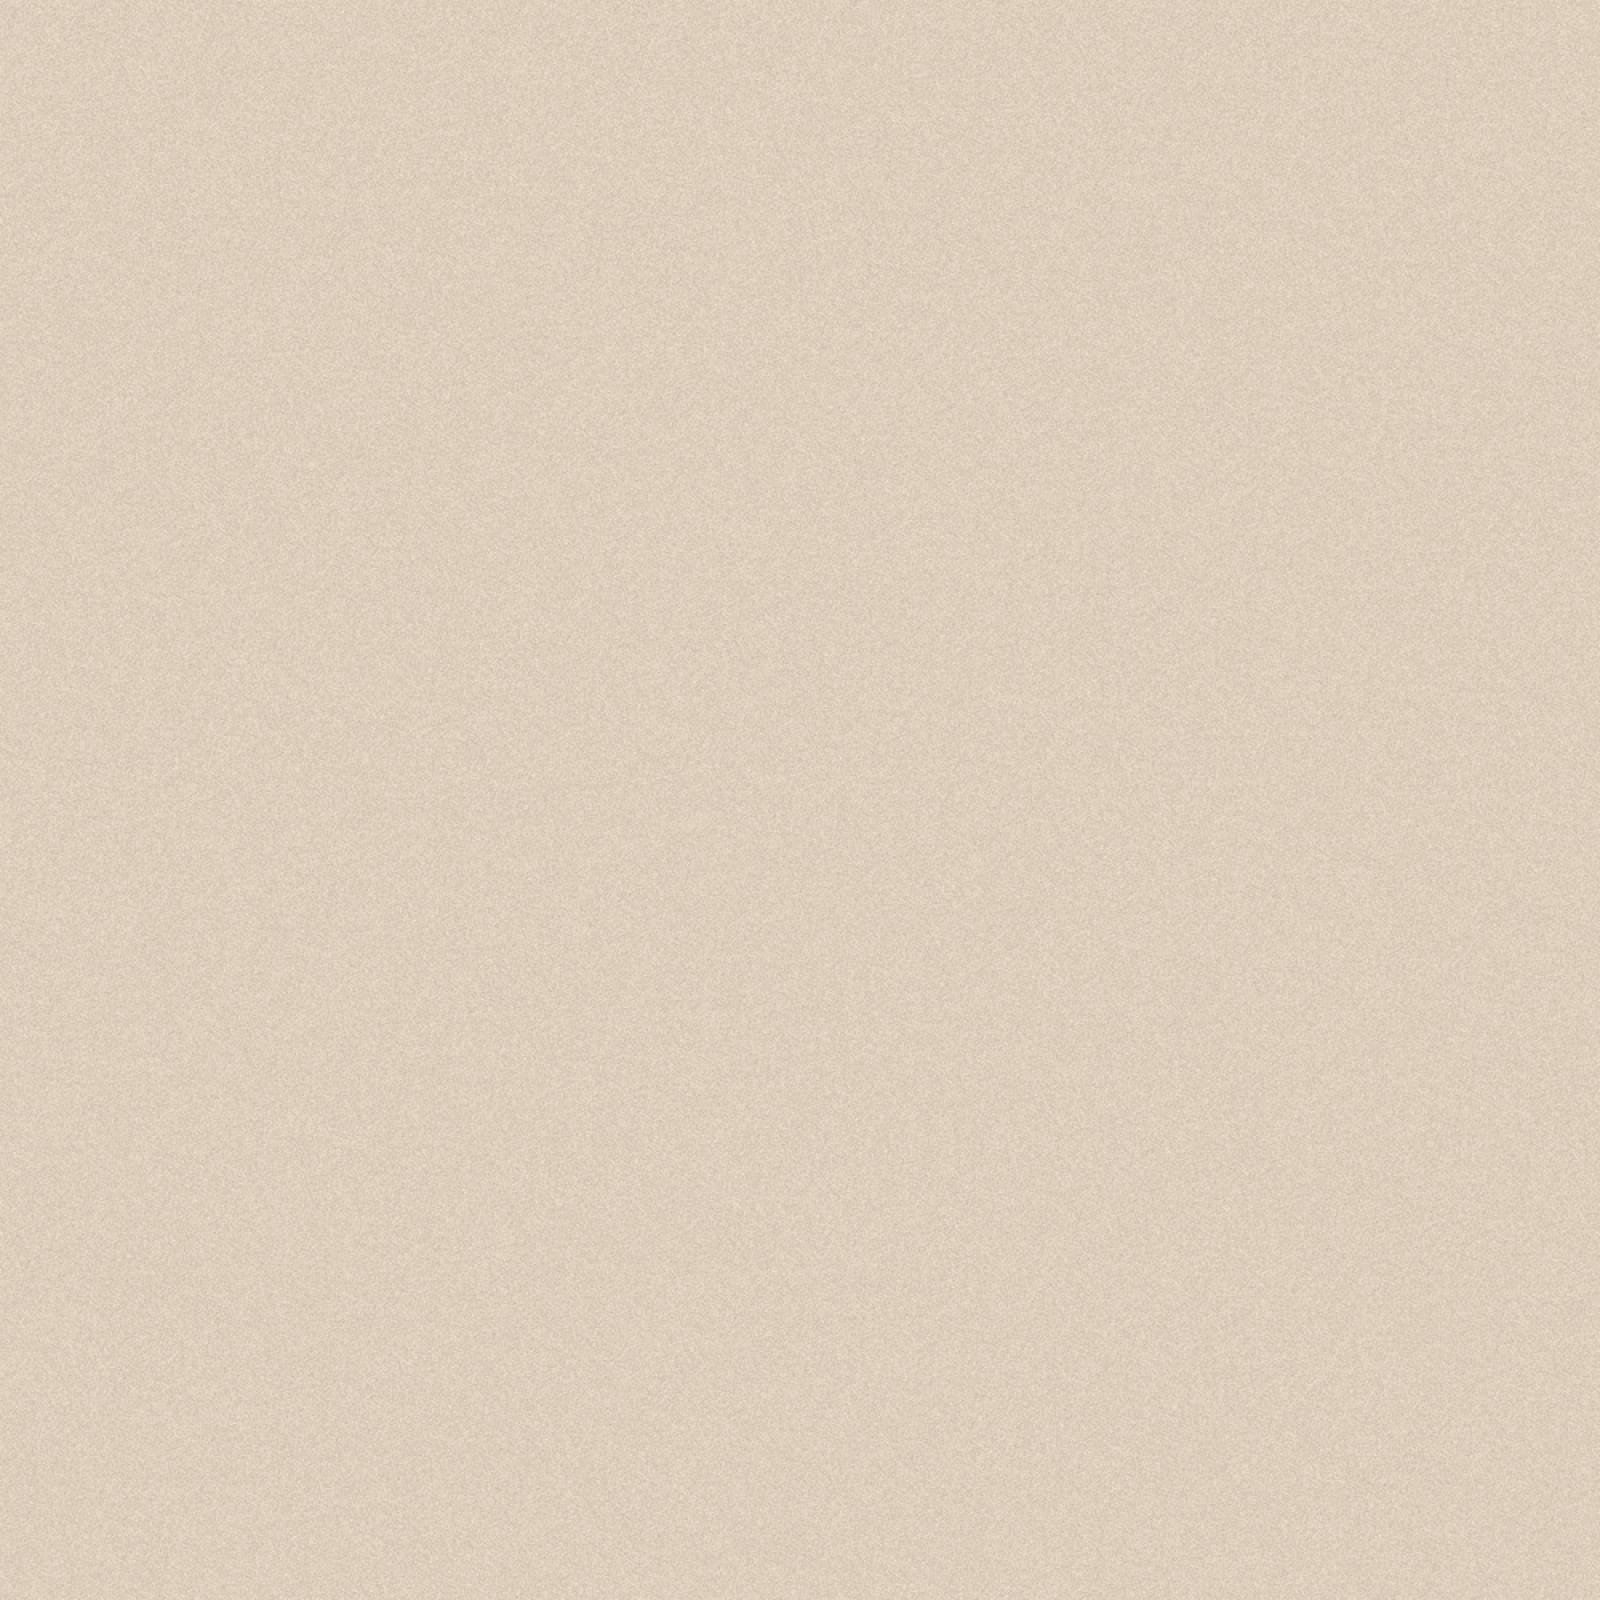 PORCELANATO 56x56cm 56480 cx2,20m² INCEFRA